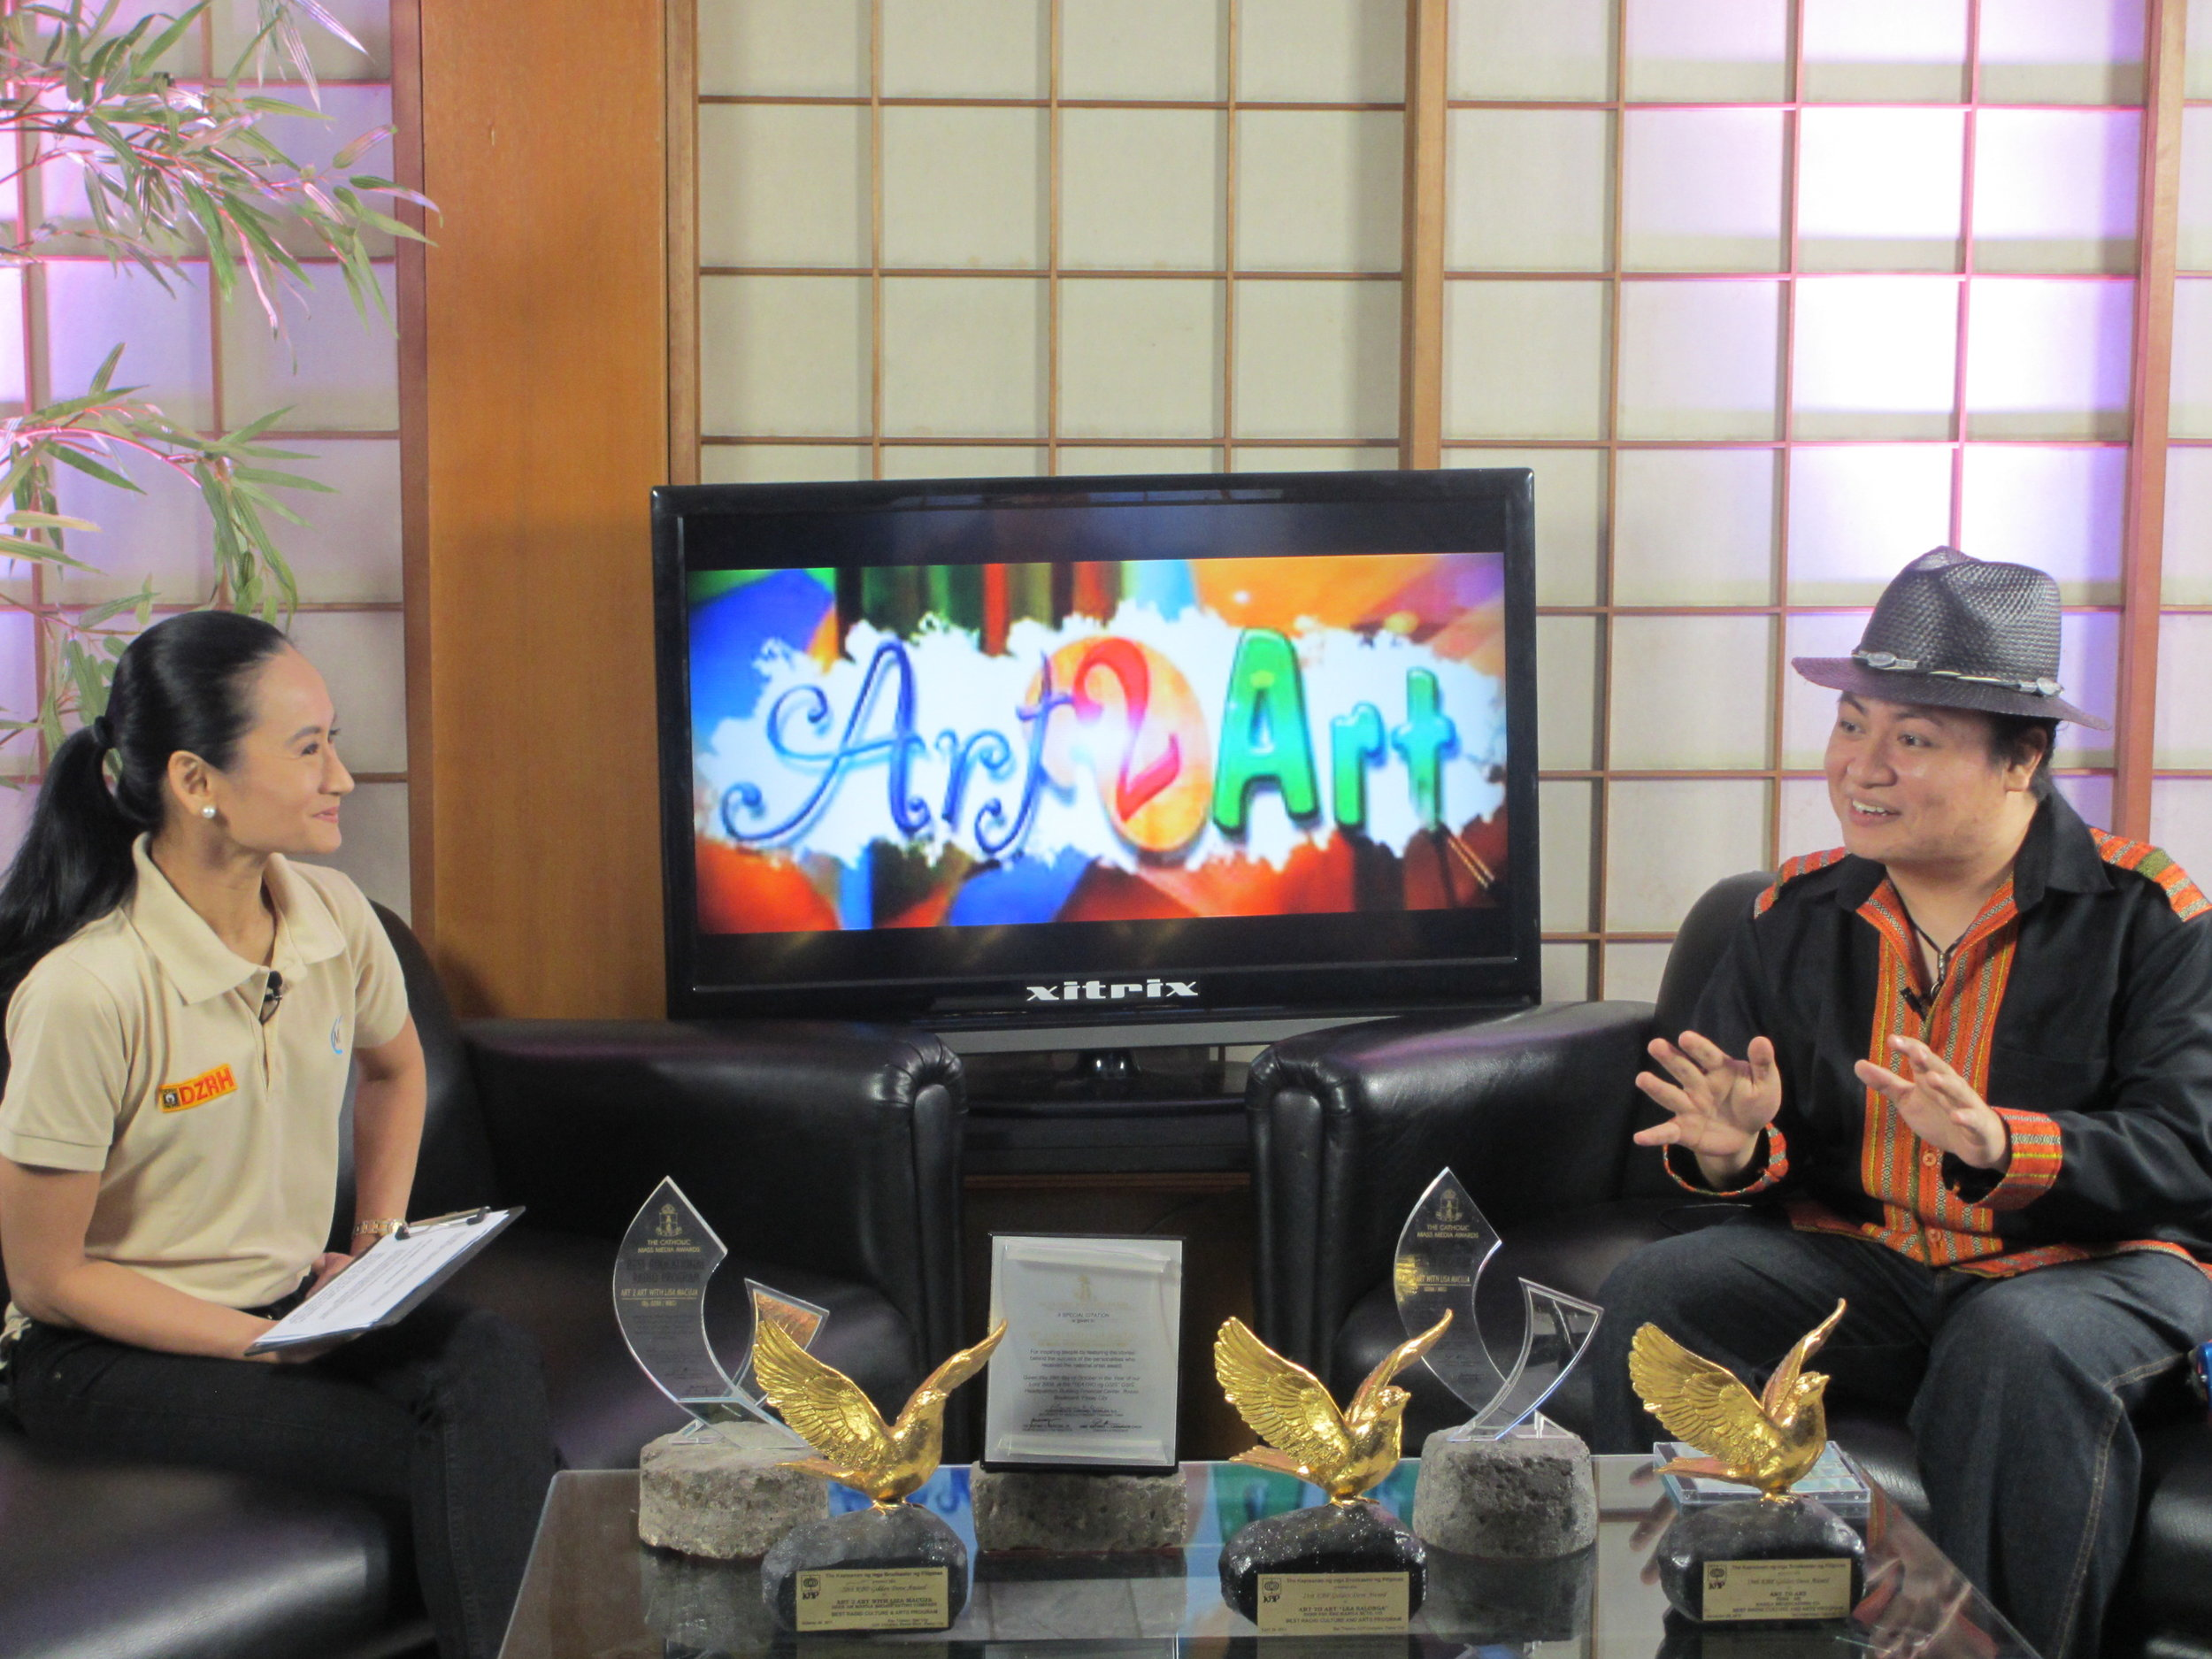 Diwa explains his creative process to    Art 2 Art    host Lisa Macuja as a guest of the program in 2013. Photo by Susan A. De Guzman